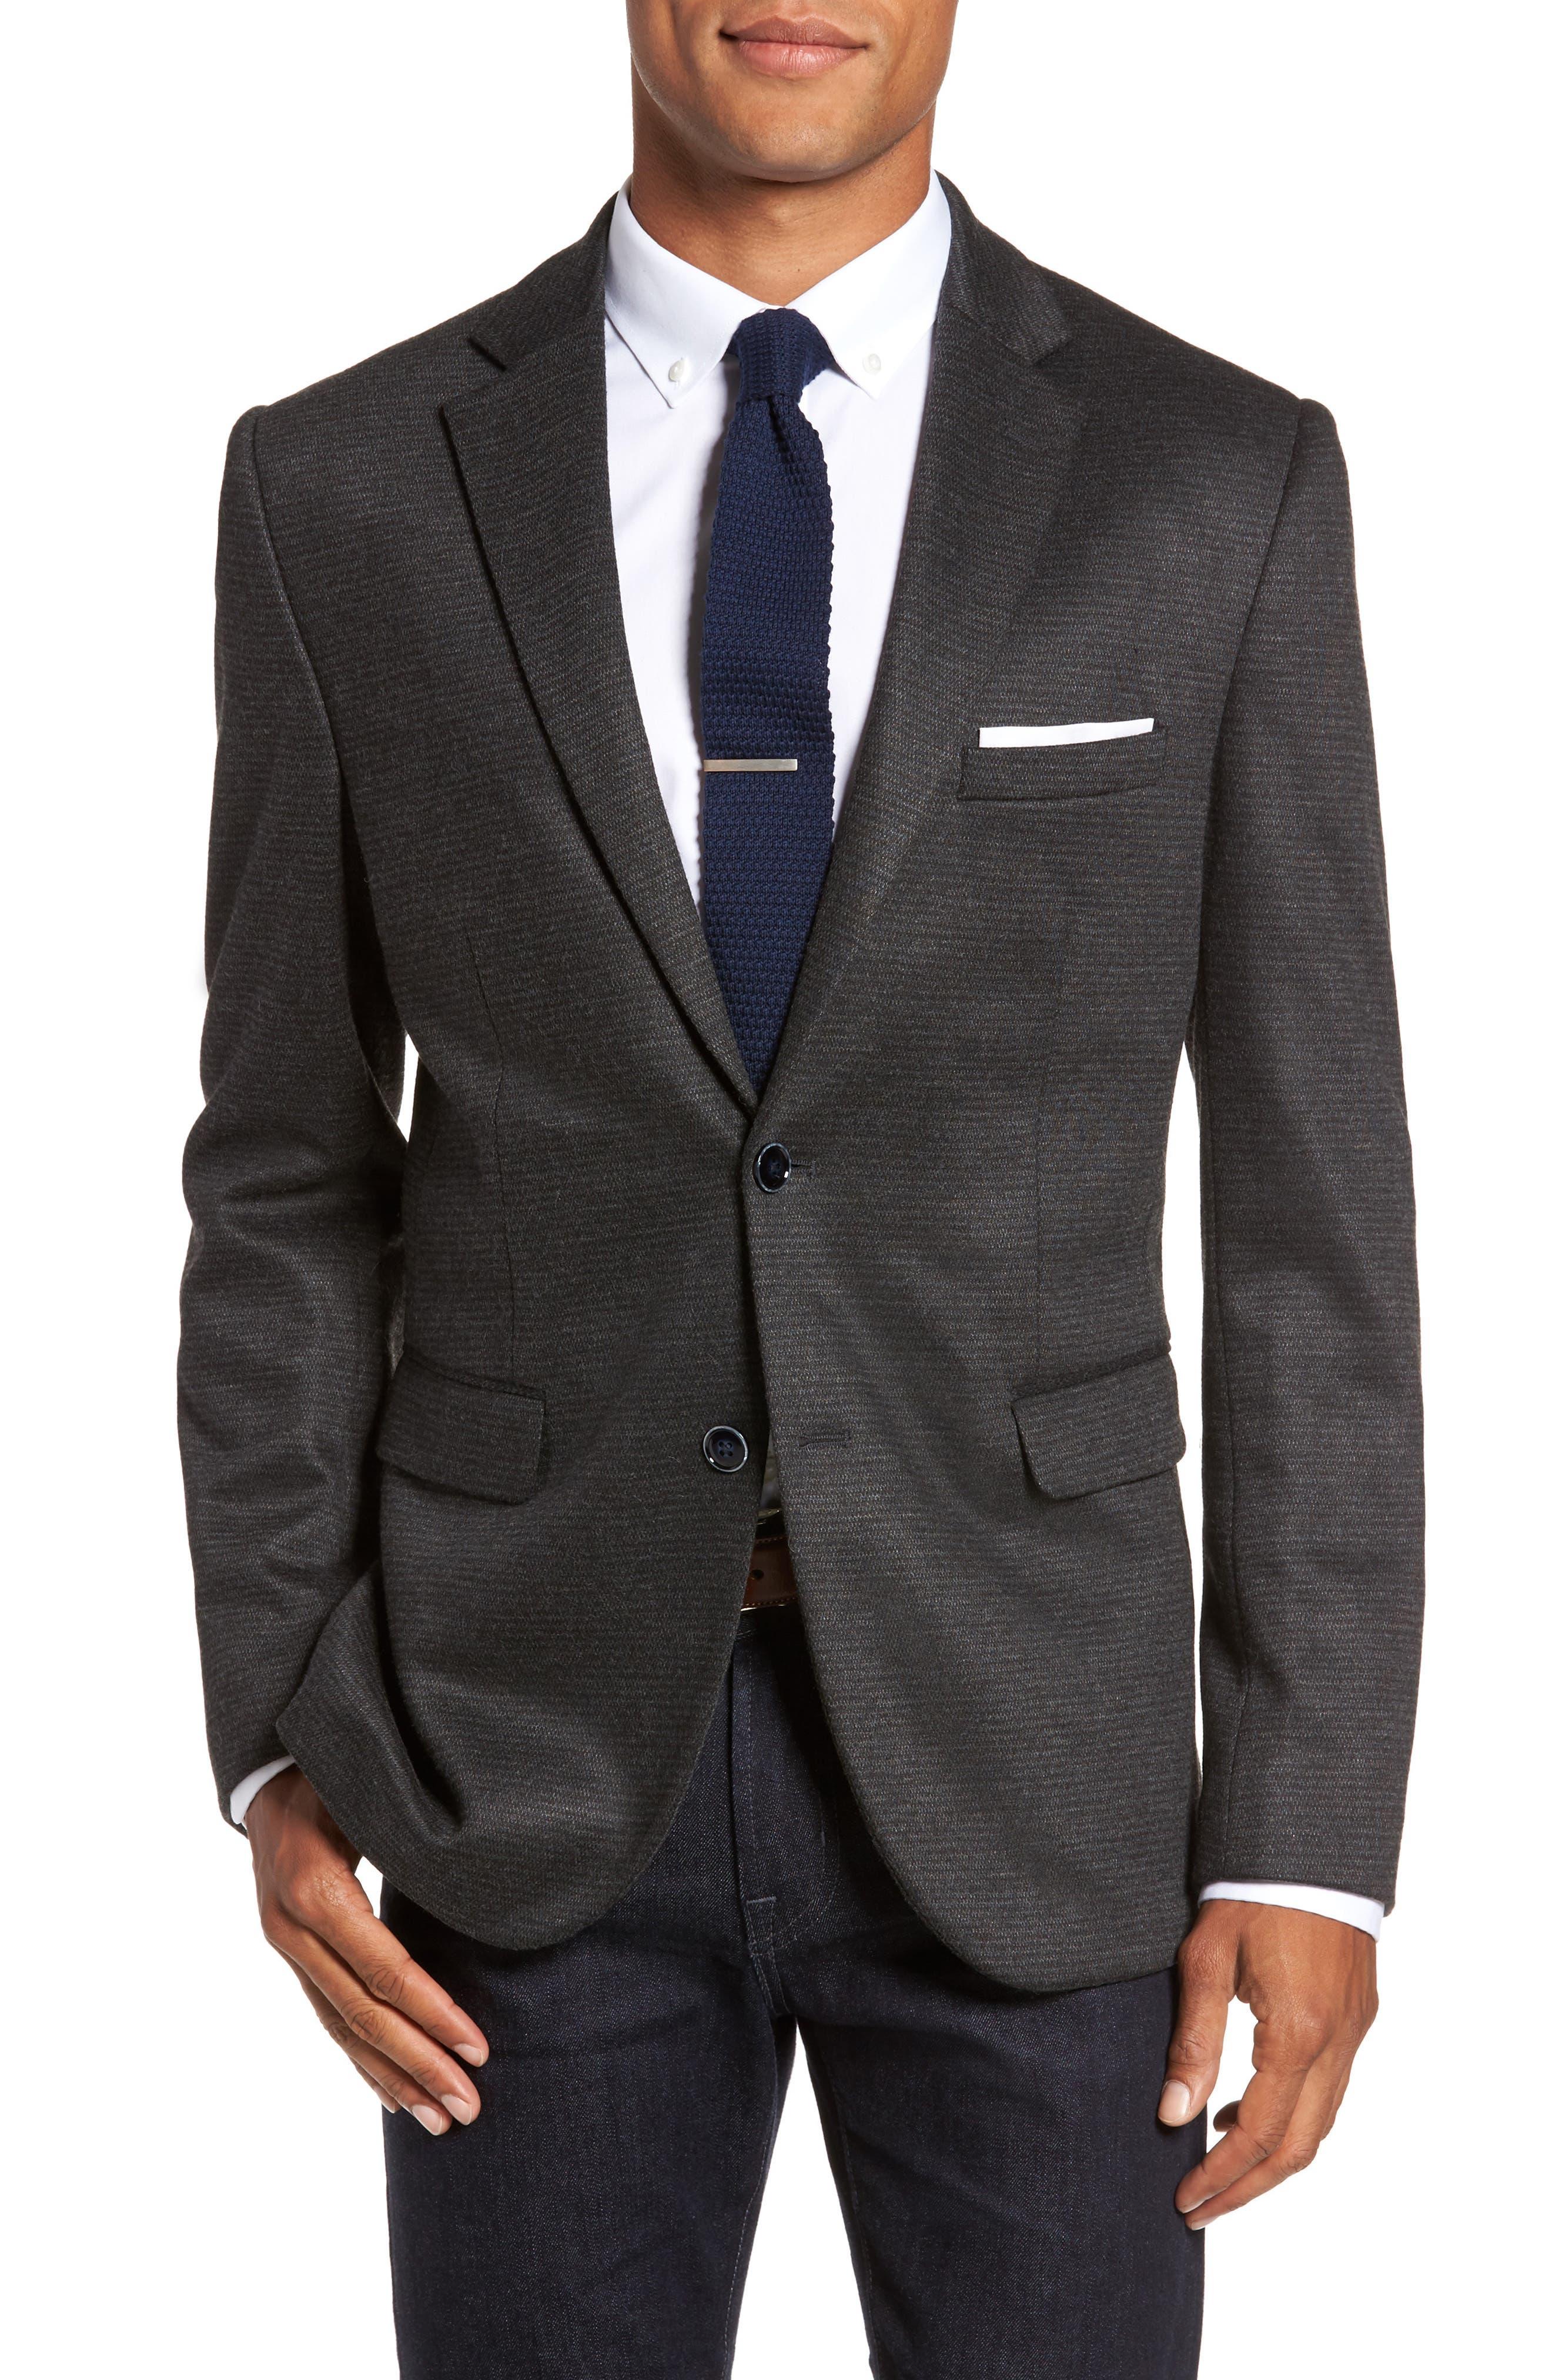 Alternate Image 1 Selected - JKT New York Trim Fit Solid Sport Coat